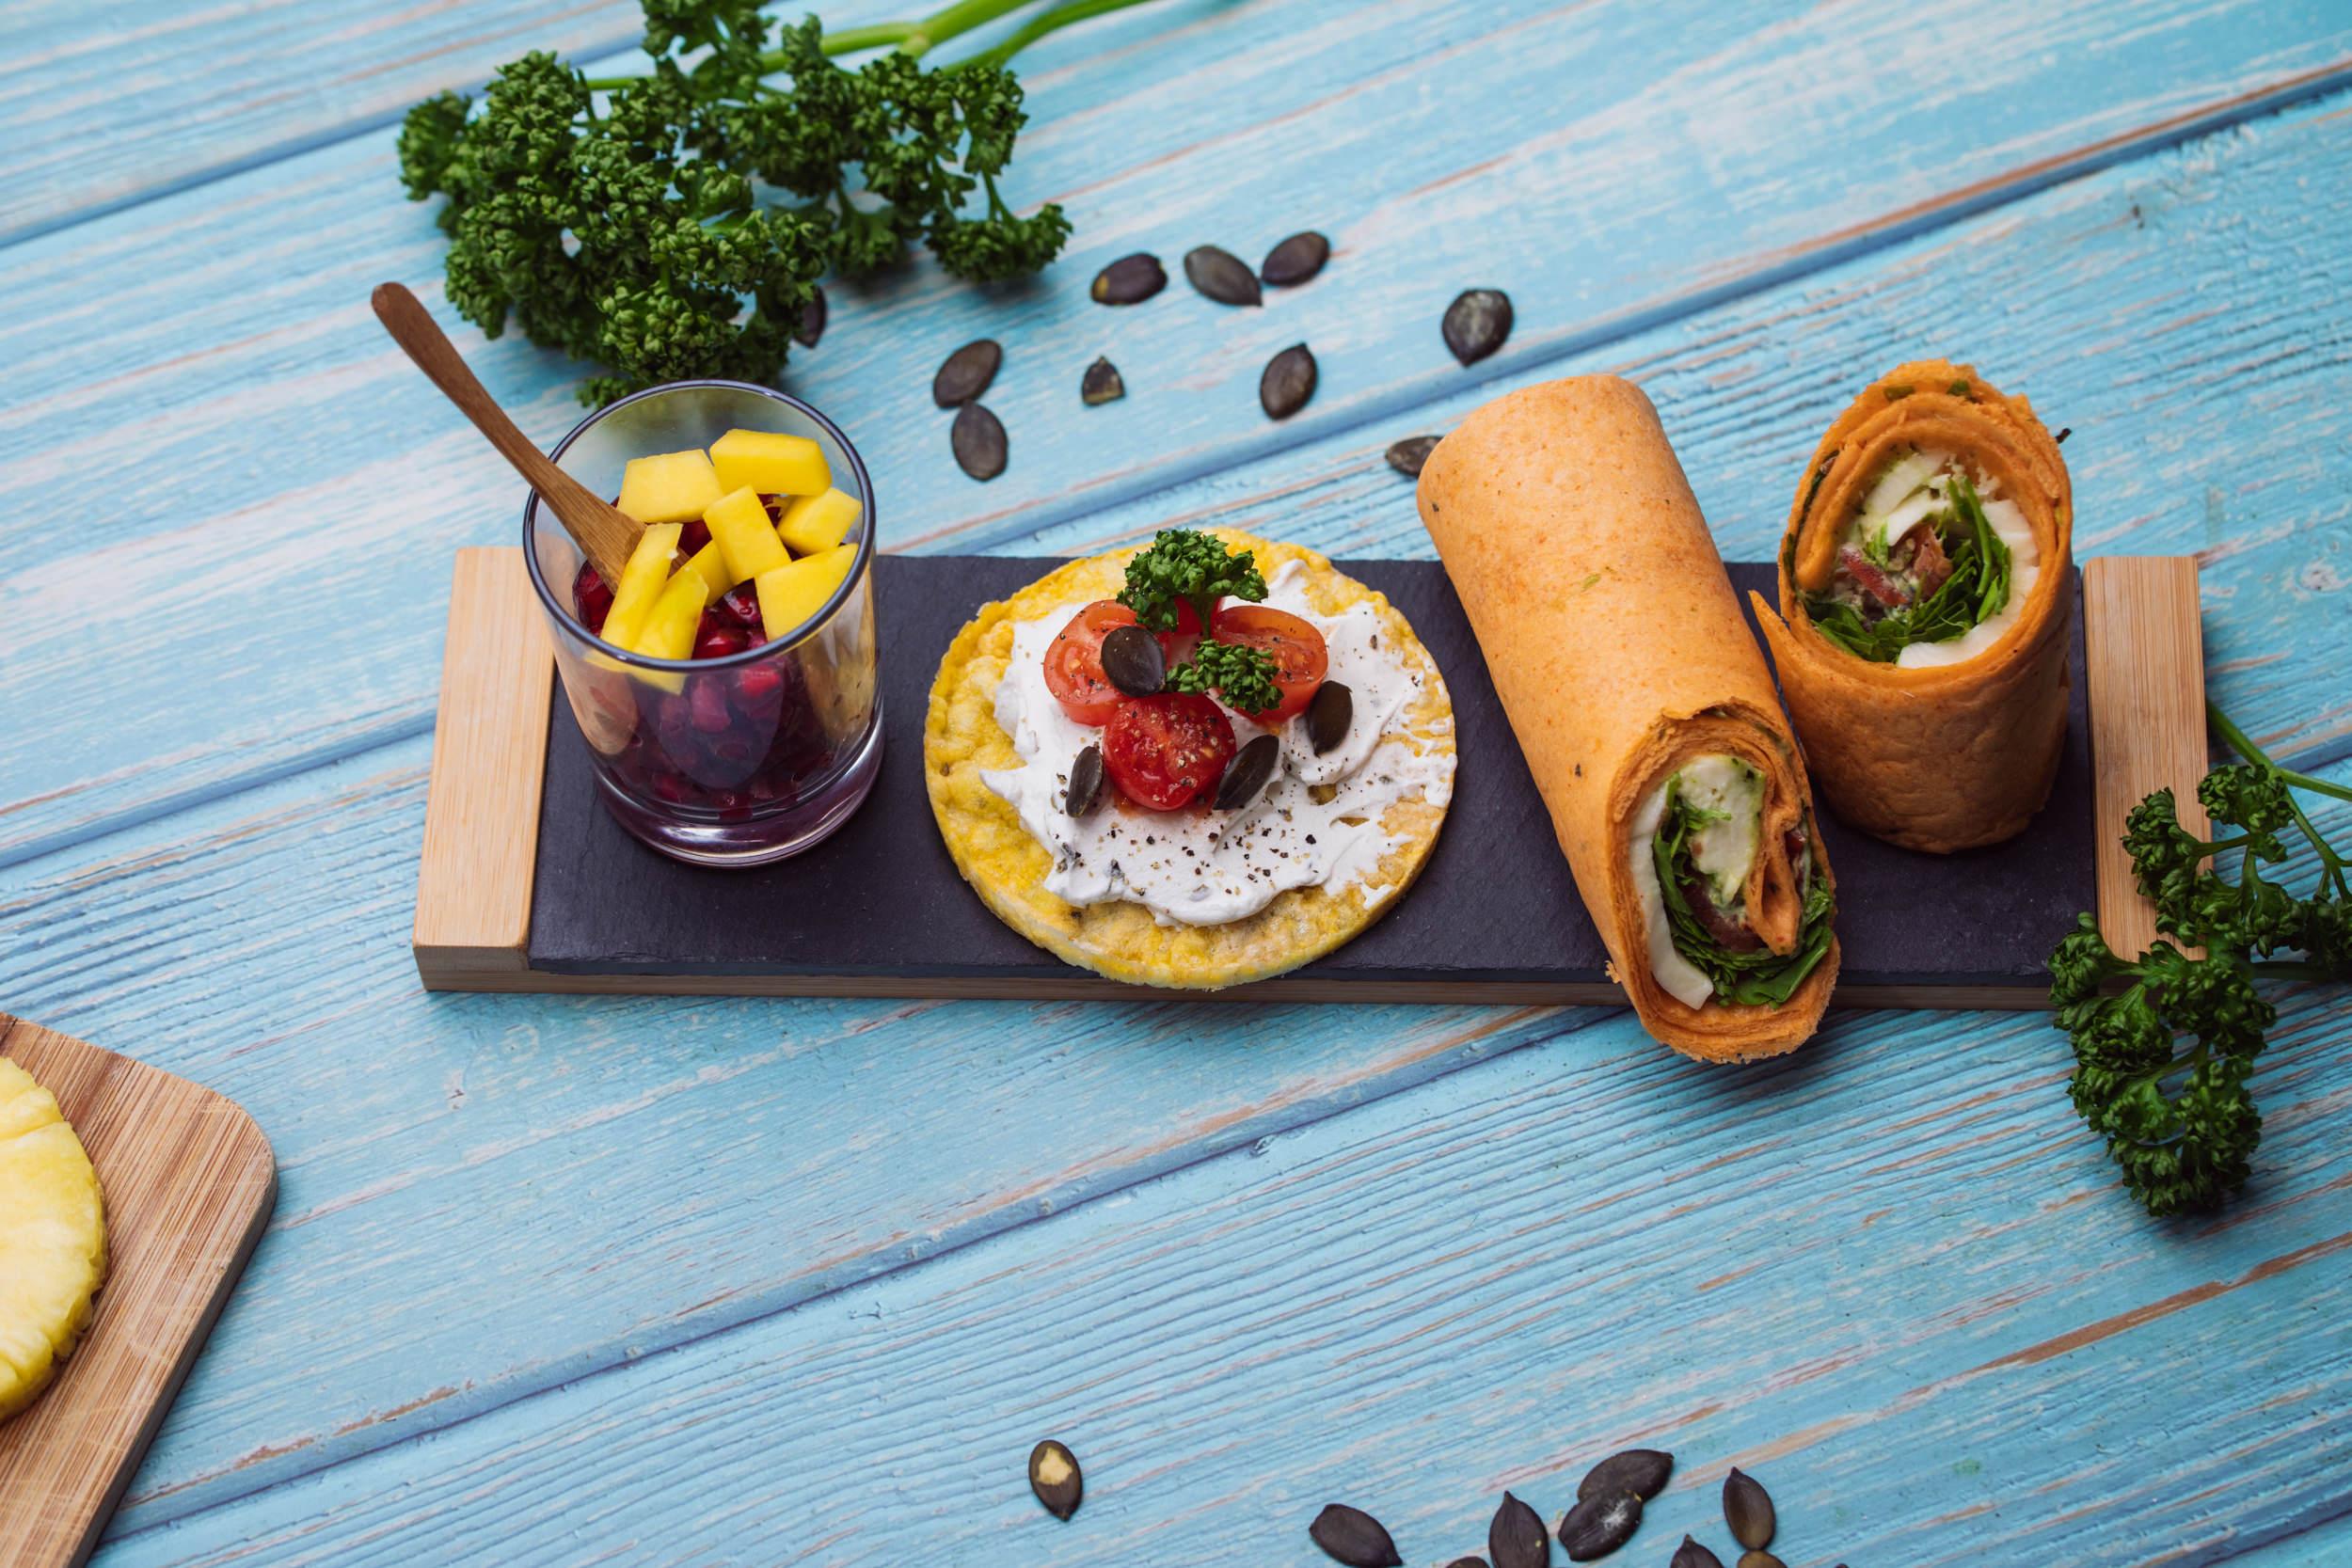 FOOD STUDIO PATRICKSCHMETZER ESSEN 4  Food